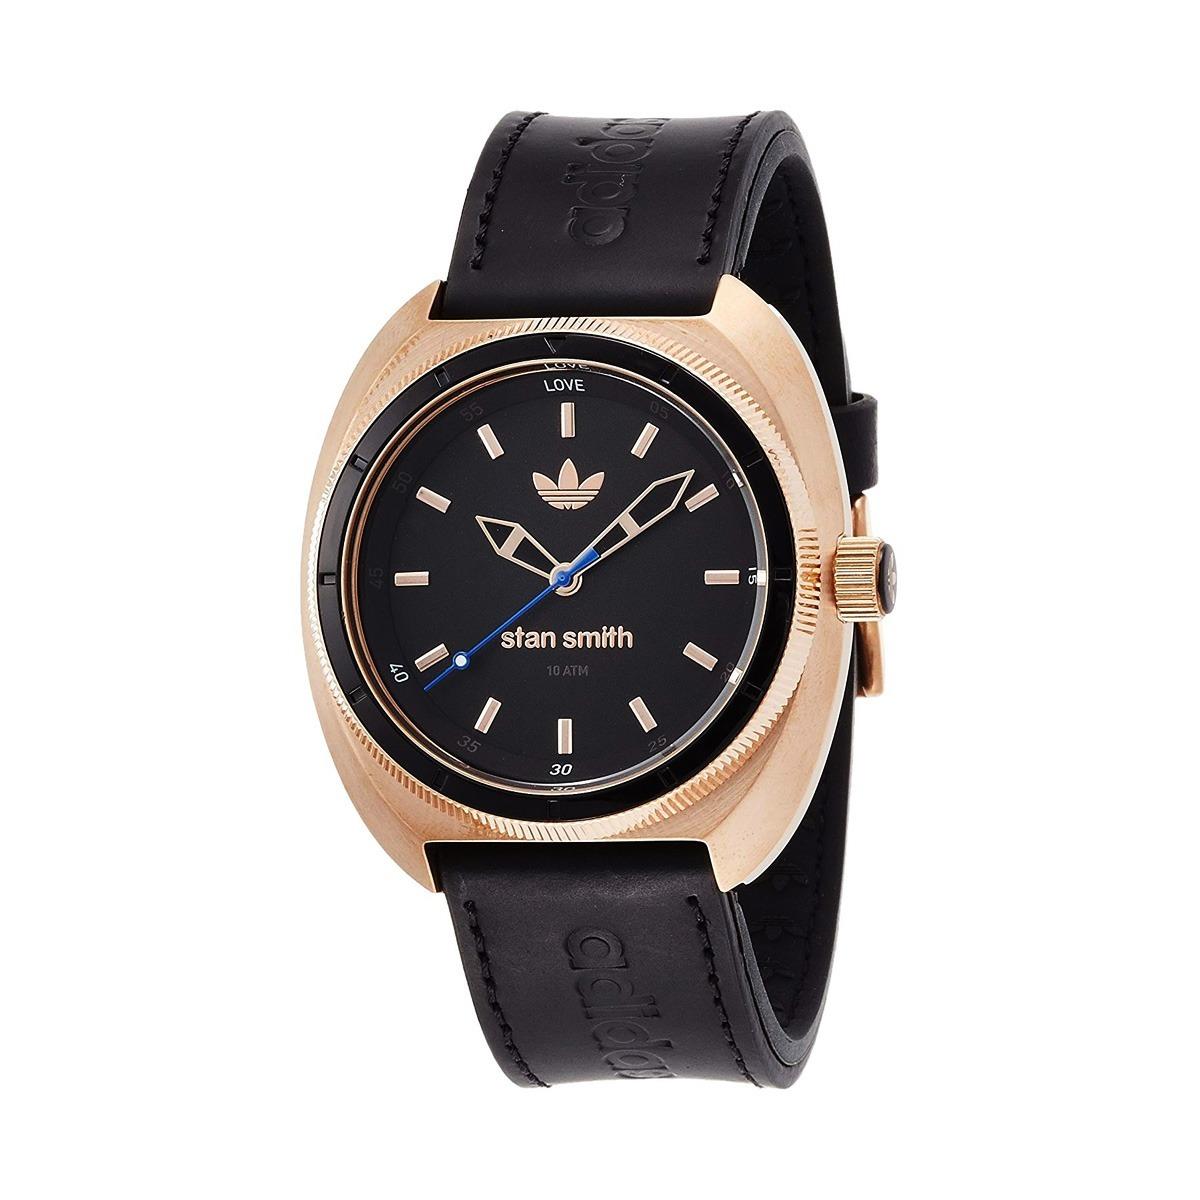 Reloj adidas Originals Stan Smith Adh3083 Analogico Cuero